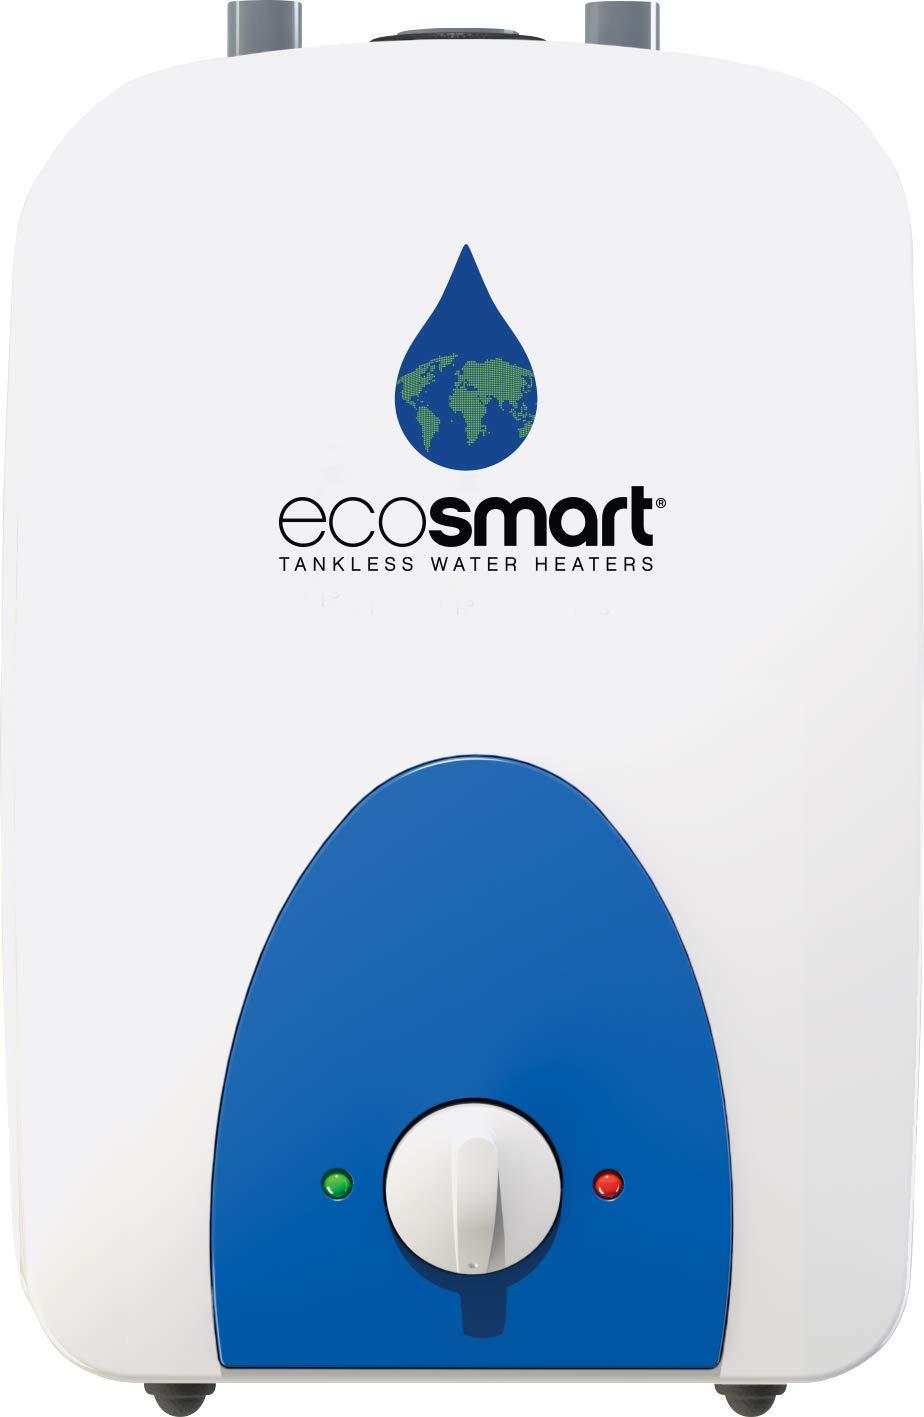 Ecosmart ECO MINI 2.5 2.5-Gallon 120V Electric Mini Tank Water Heater by Ecosmart